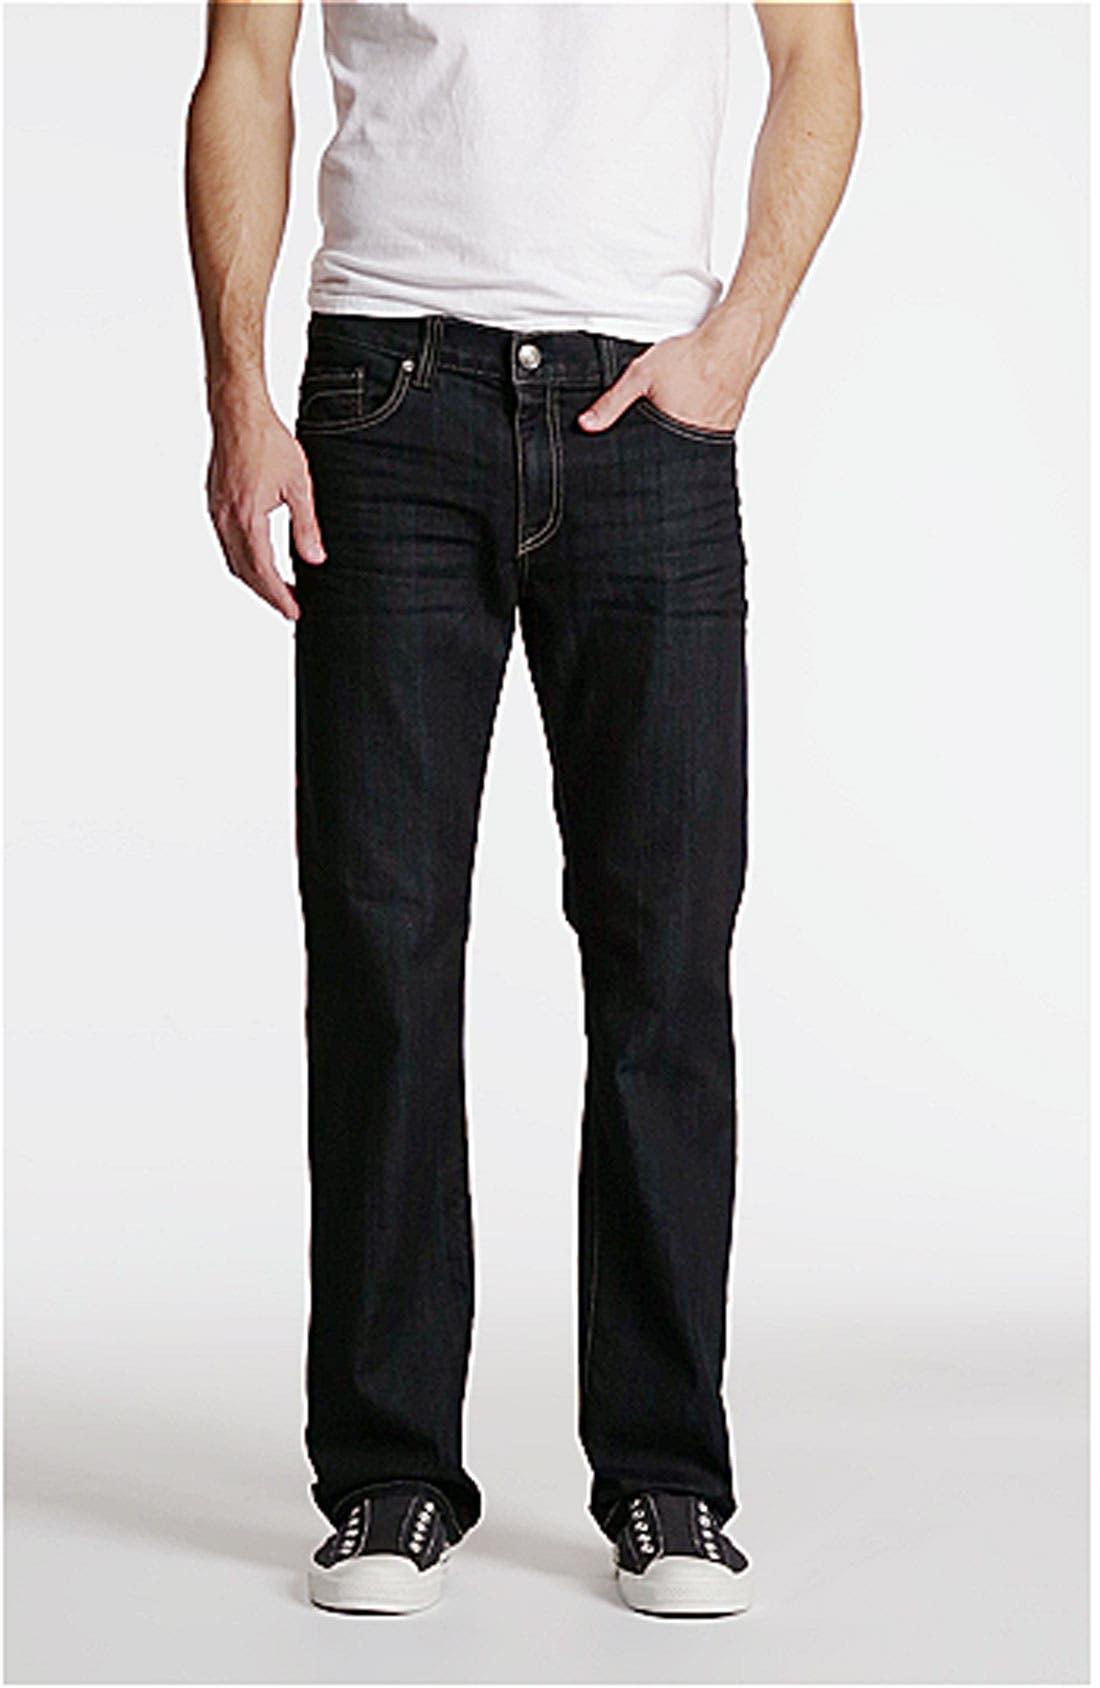 '50-11' Straight Leg Jeans,                             Alternate thumbnail 4, color,